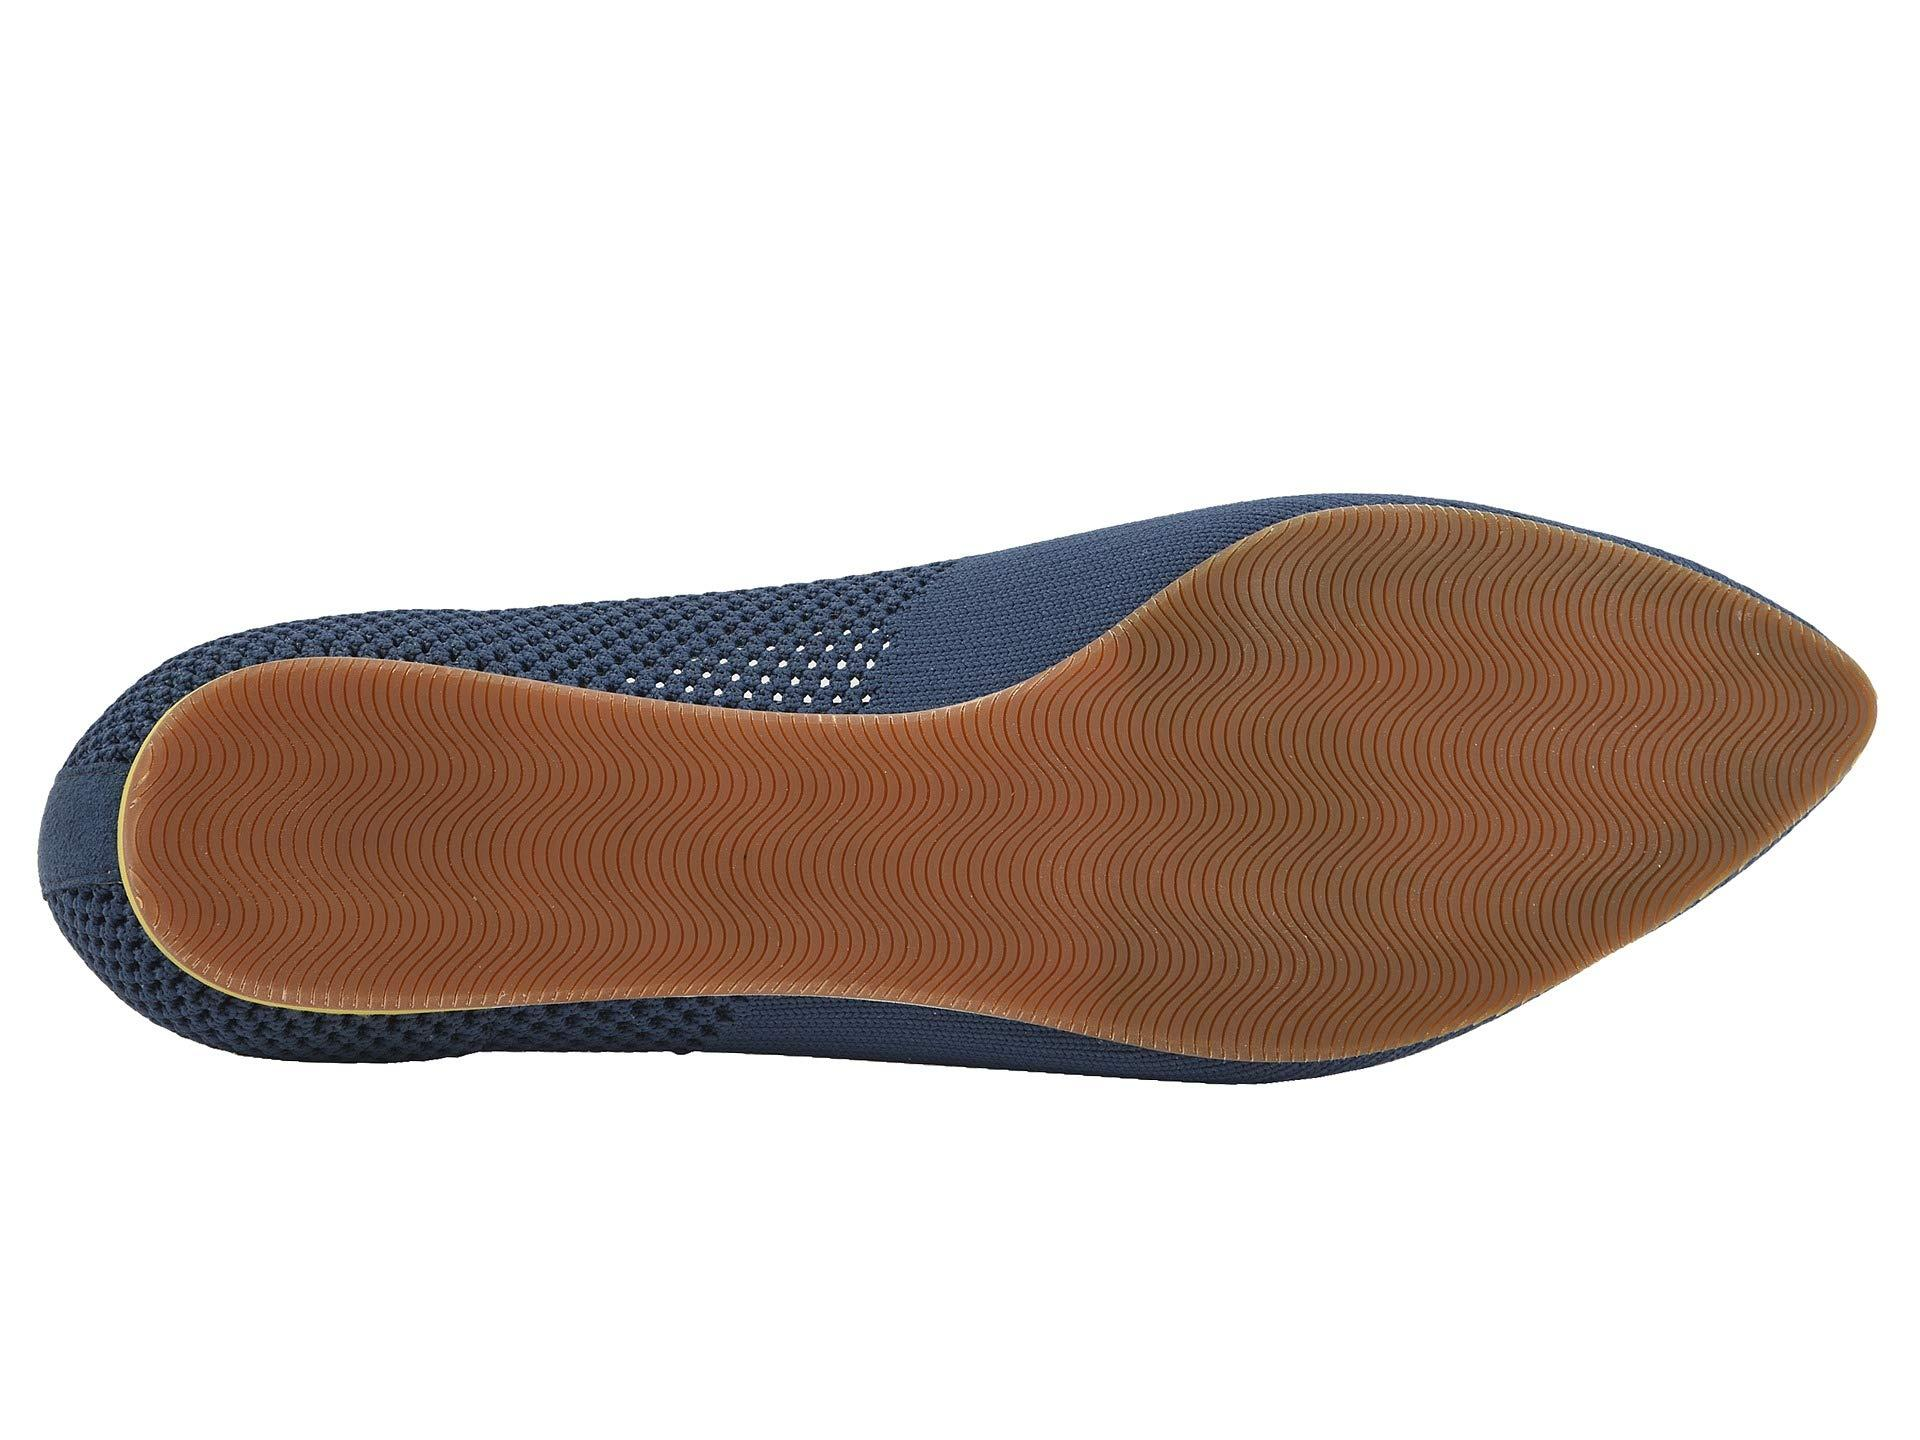 9e5f91862d2 Softwalk® - Blue Sava X Lea Knit (cherry Red) Women s Flat Shoes -. View  fullscreen